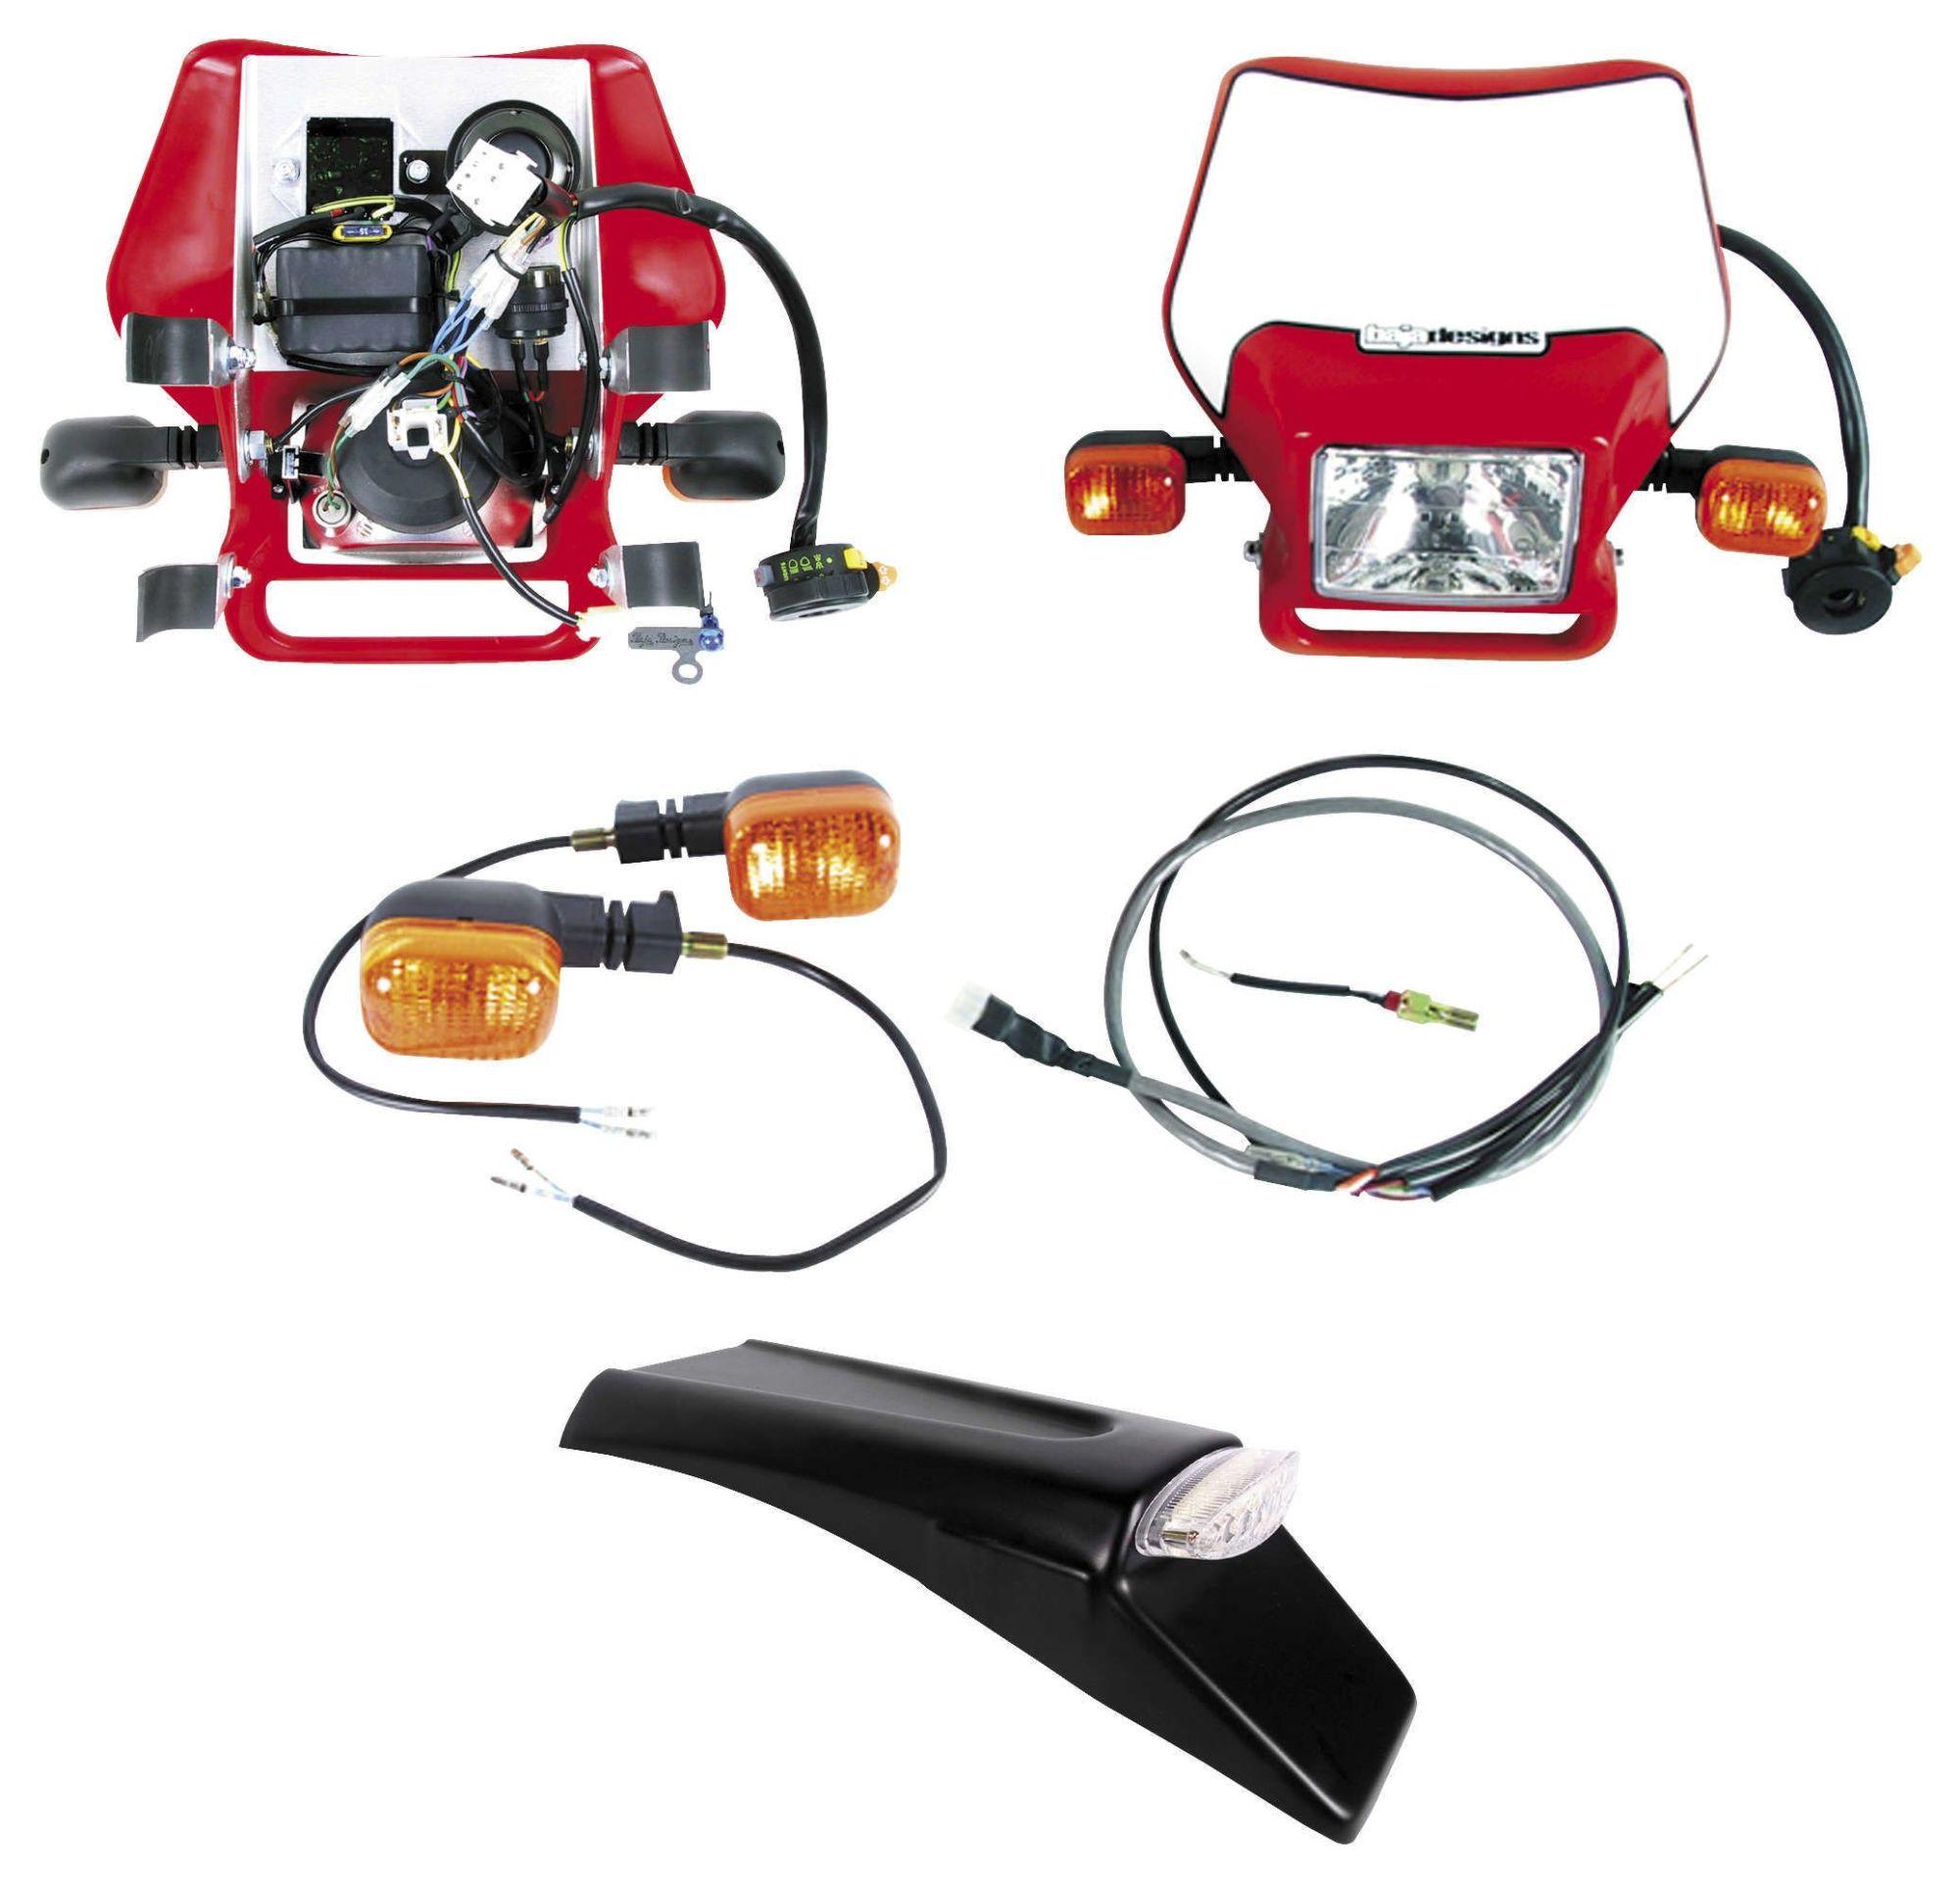 hight resolution of baja designs dual sport kit for electric start honda crf250x crf450x 2004 2016 revzilla